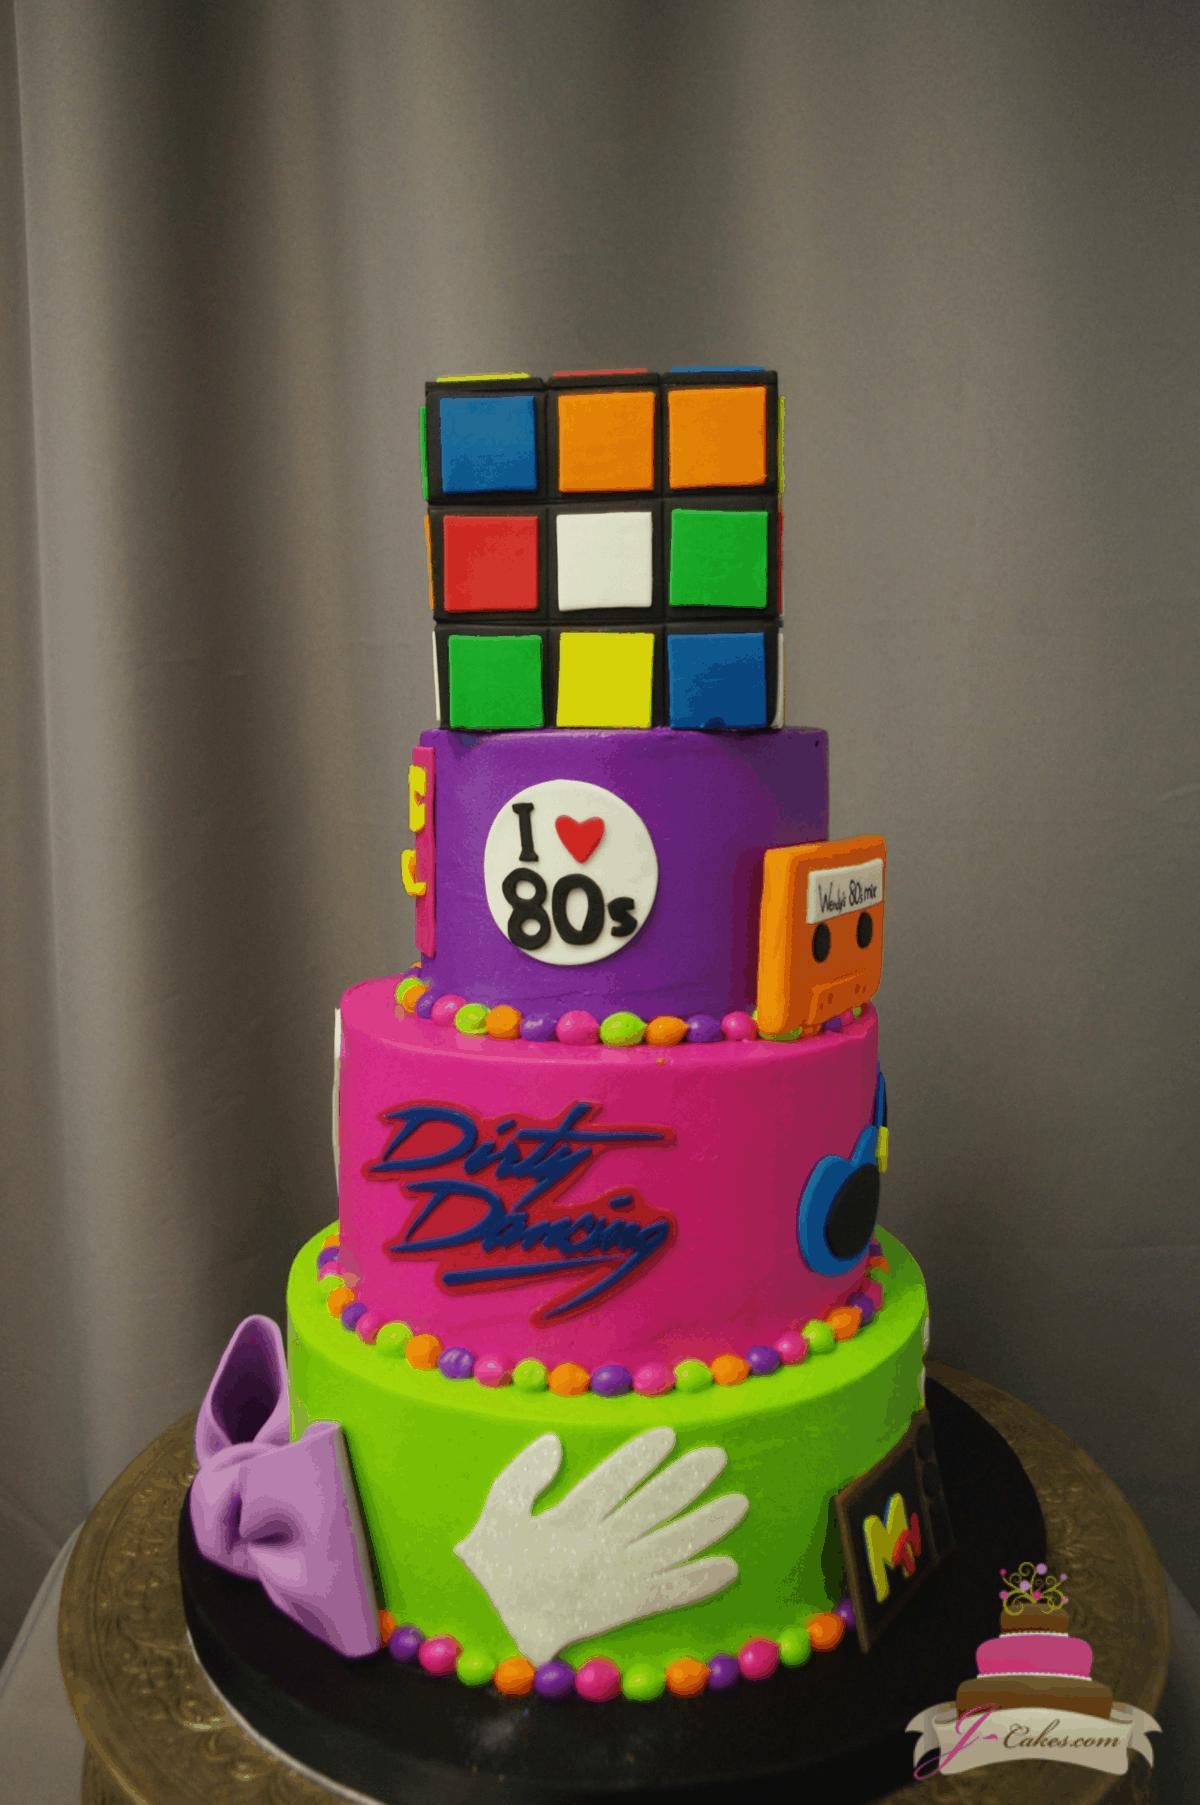 (200) 80s Birthday Cake